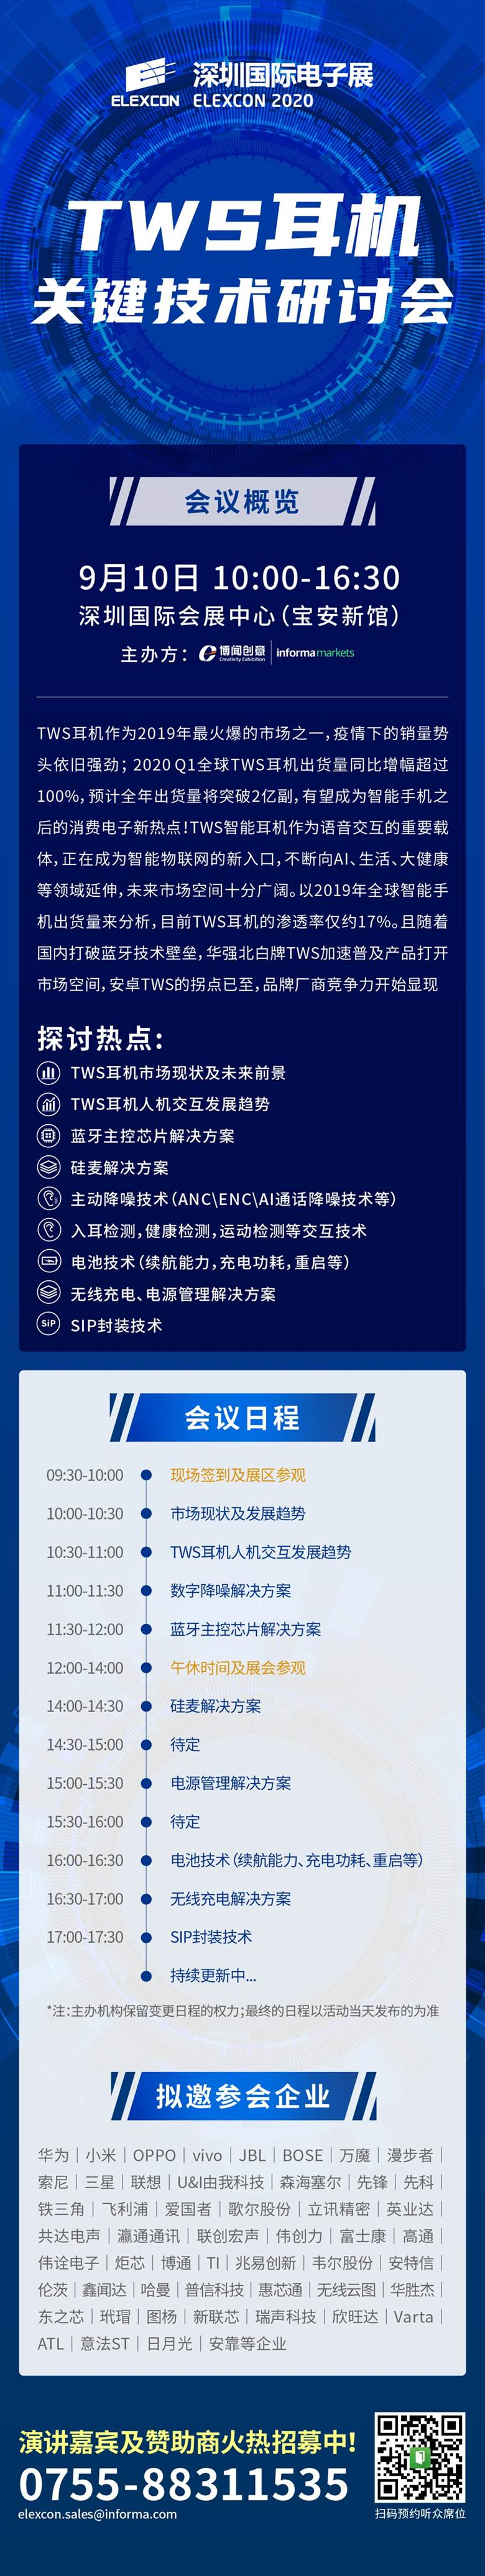 TWS耳机关键技术研讨会 长图(加日程).png